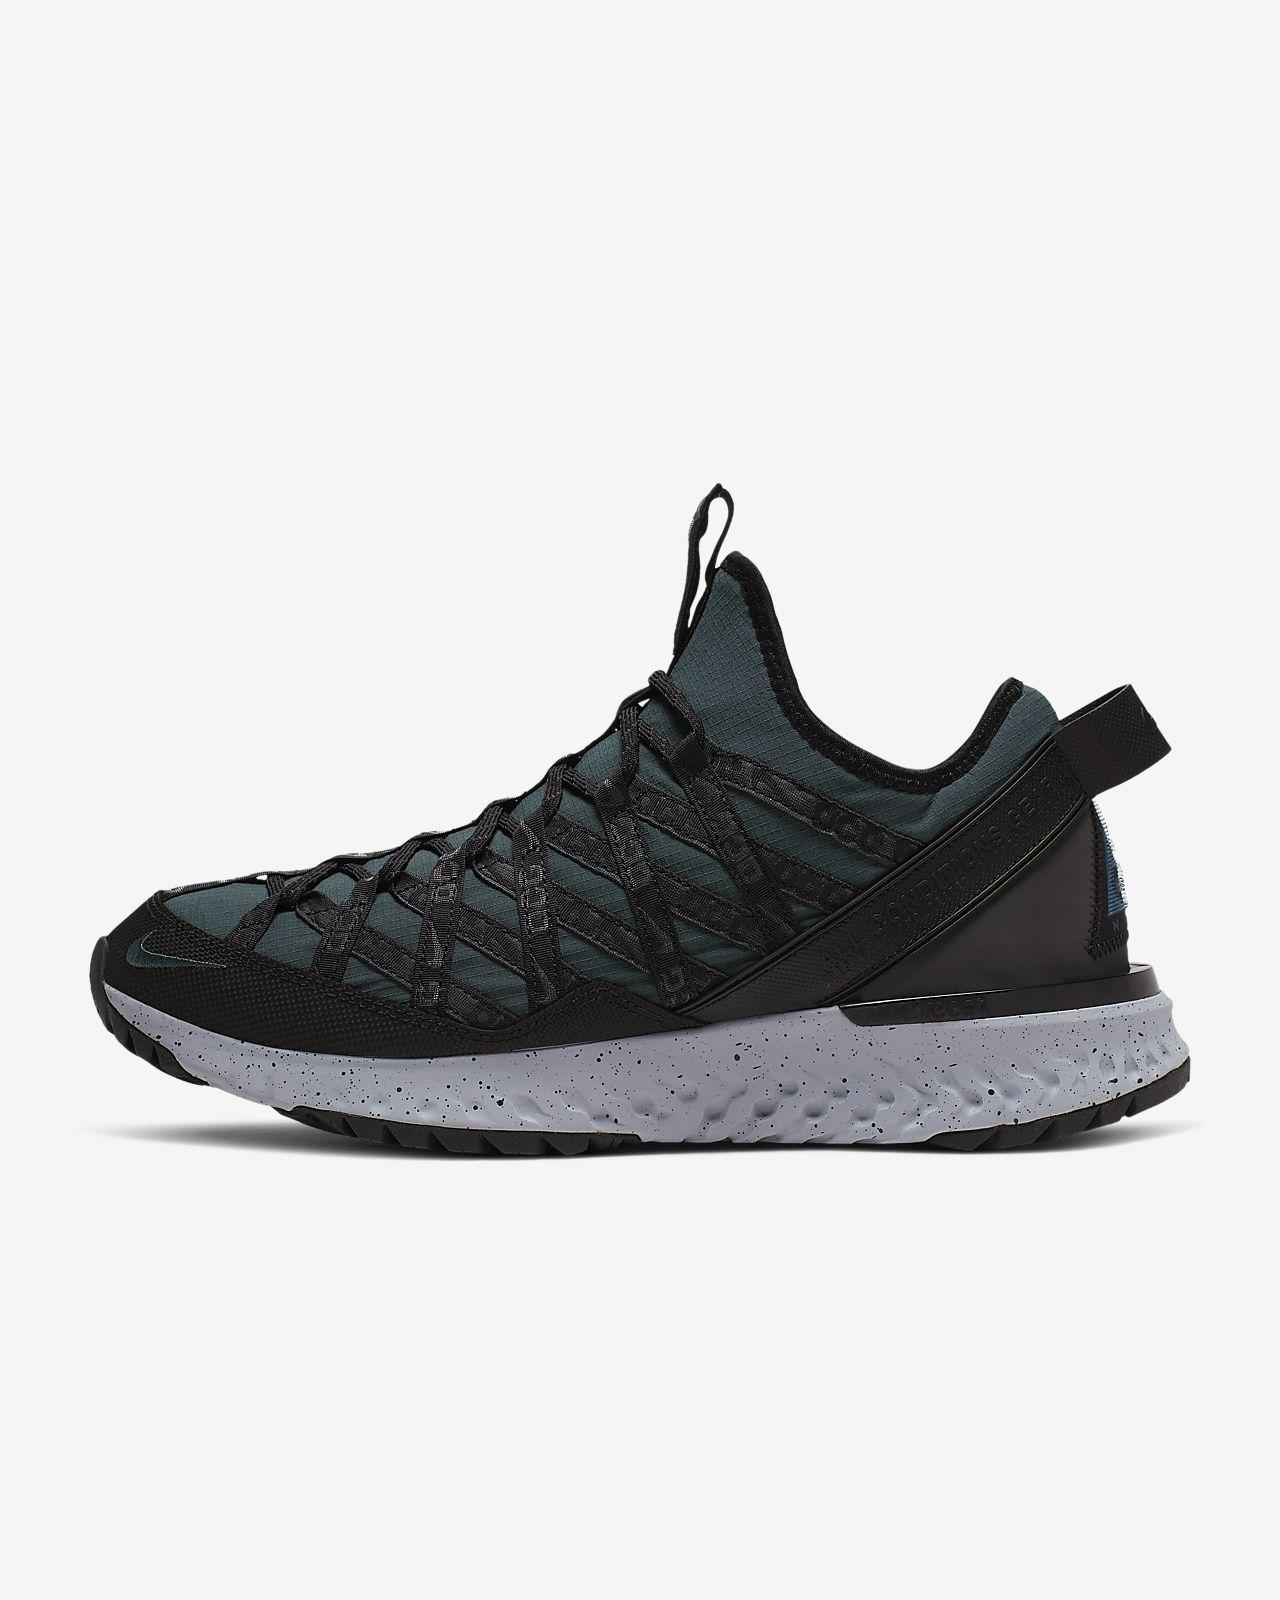 Chaussure Nike ACG React Terra Gobe pour Homme